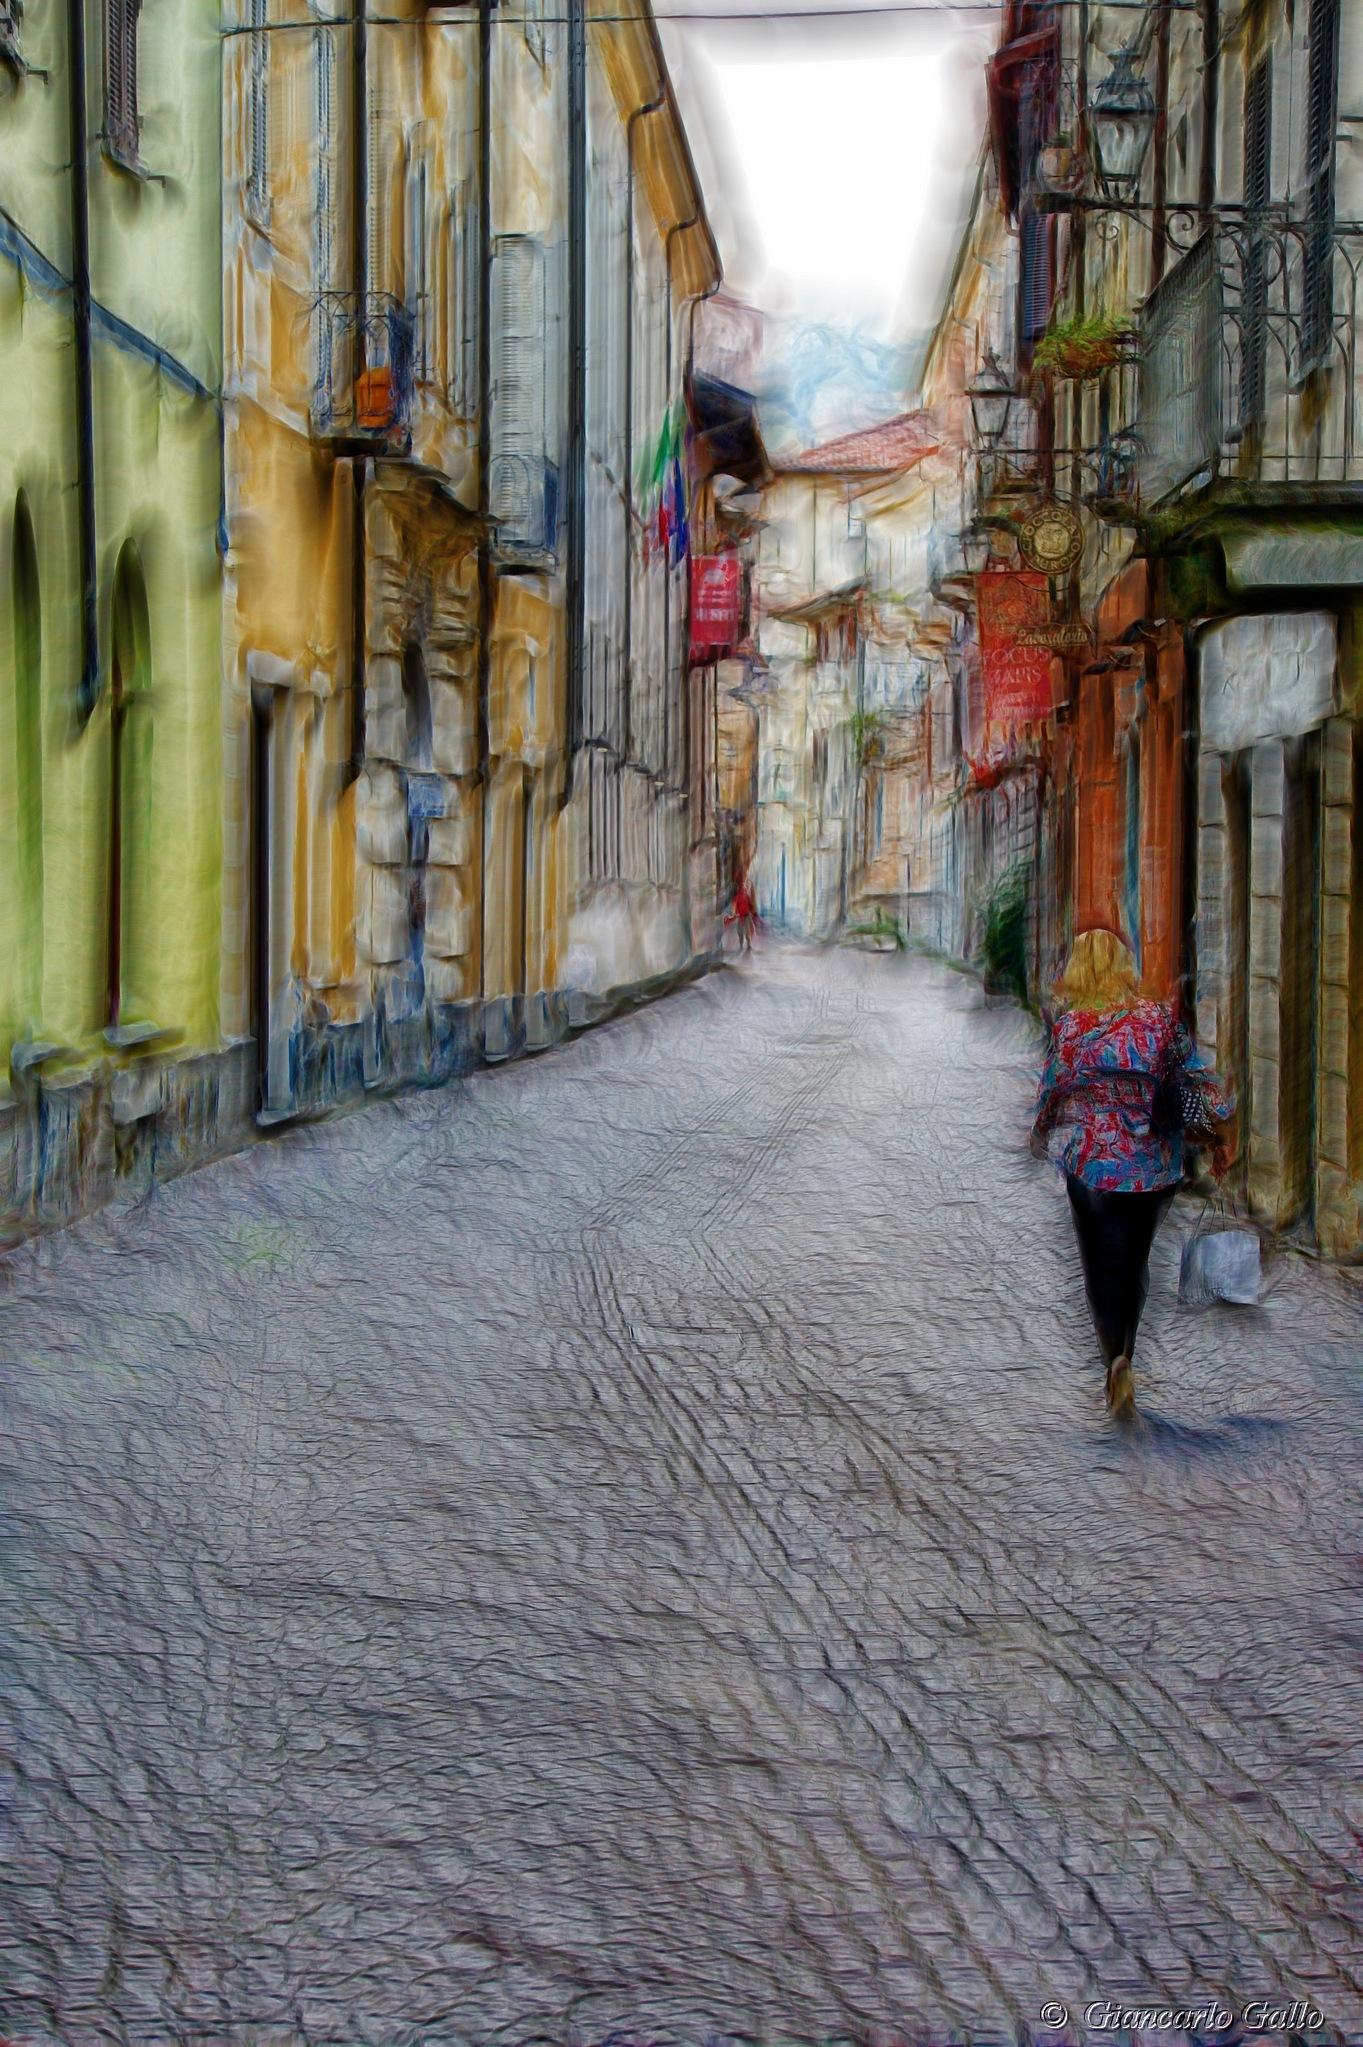 Woman with handbag by Giancarlo Gallo